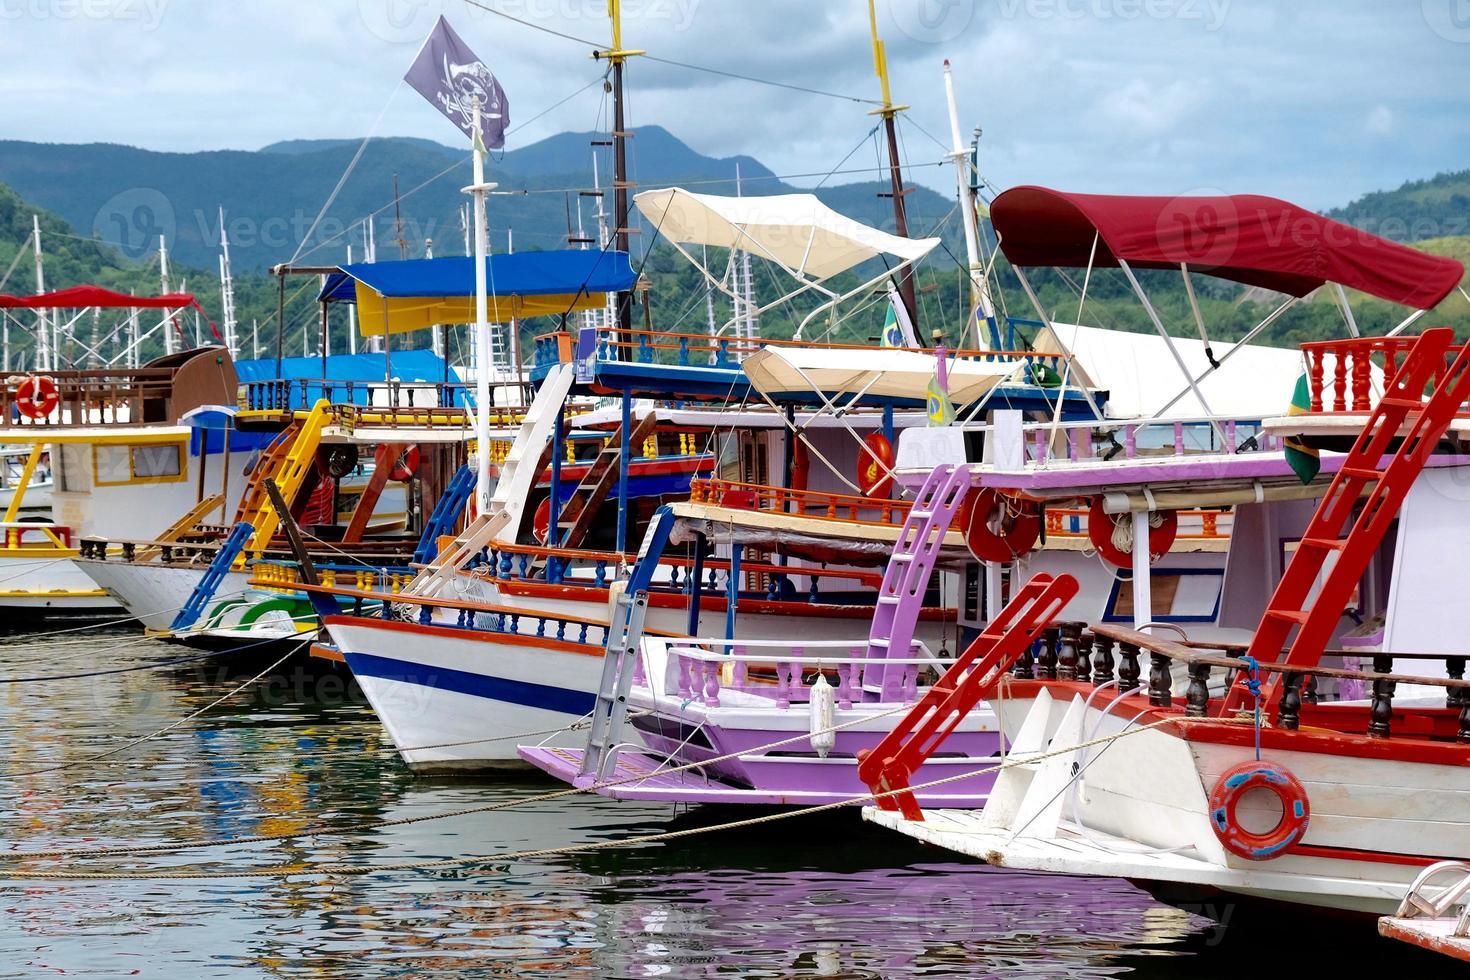 Colorful boats photo